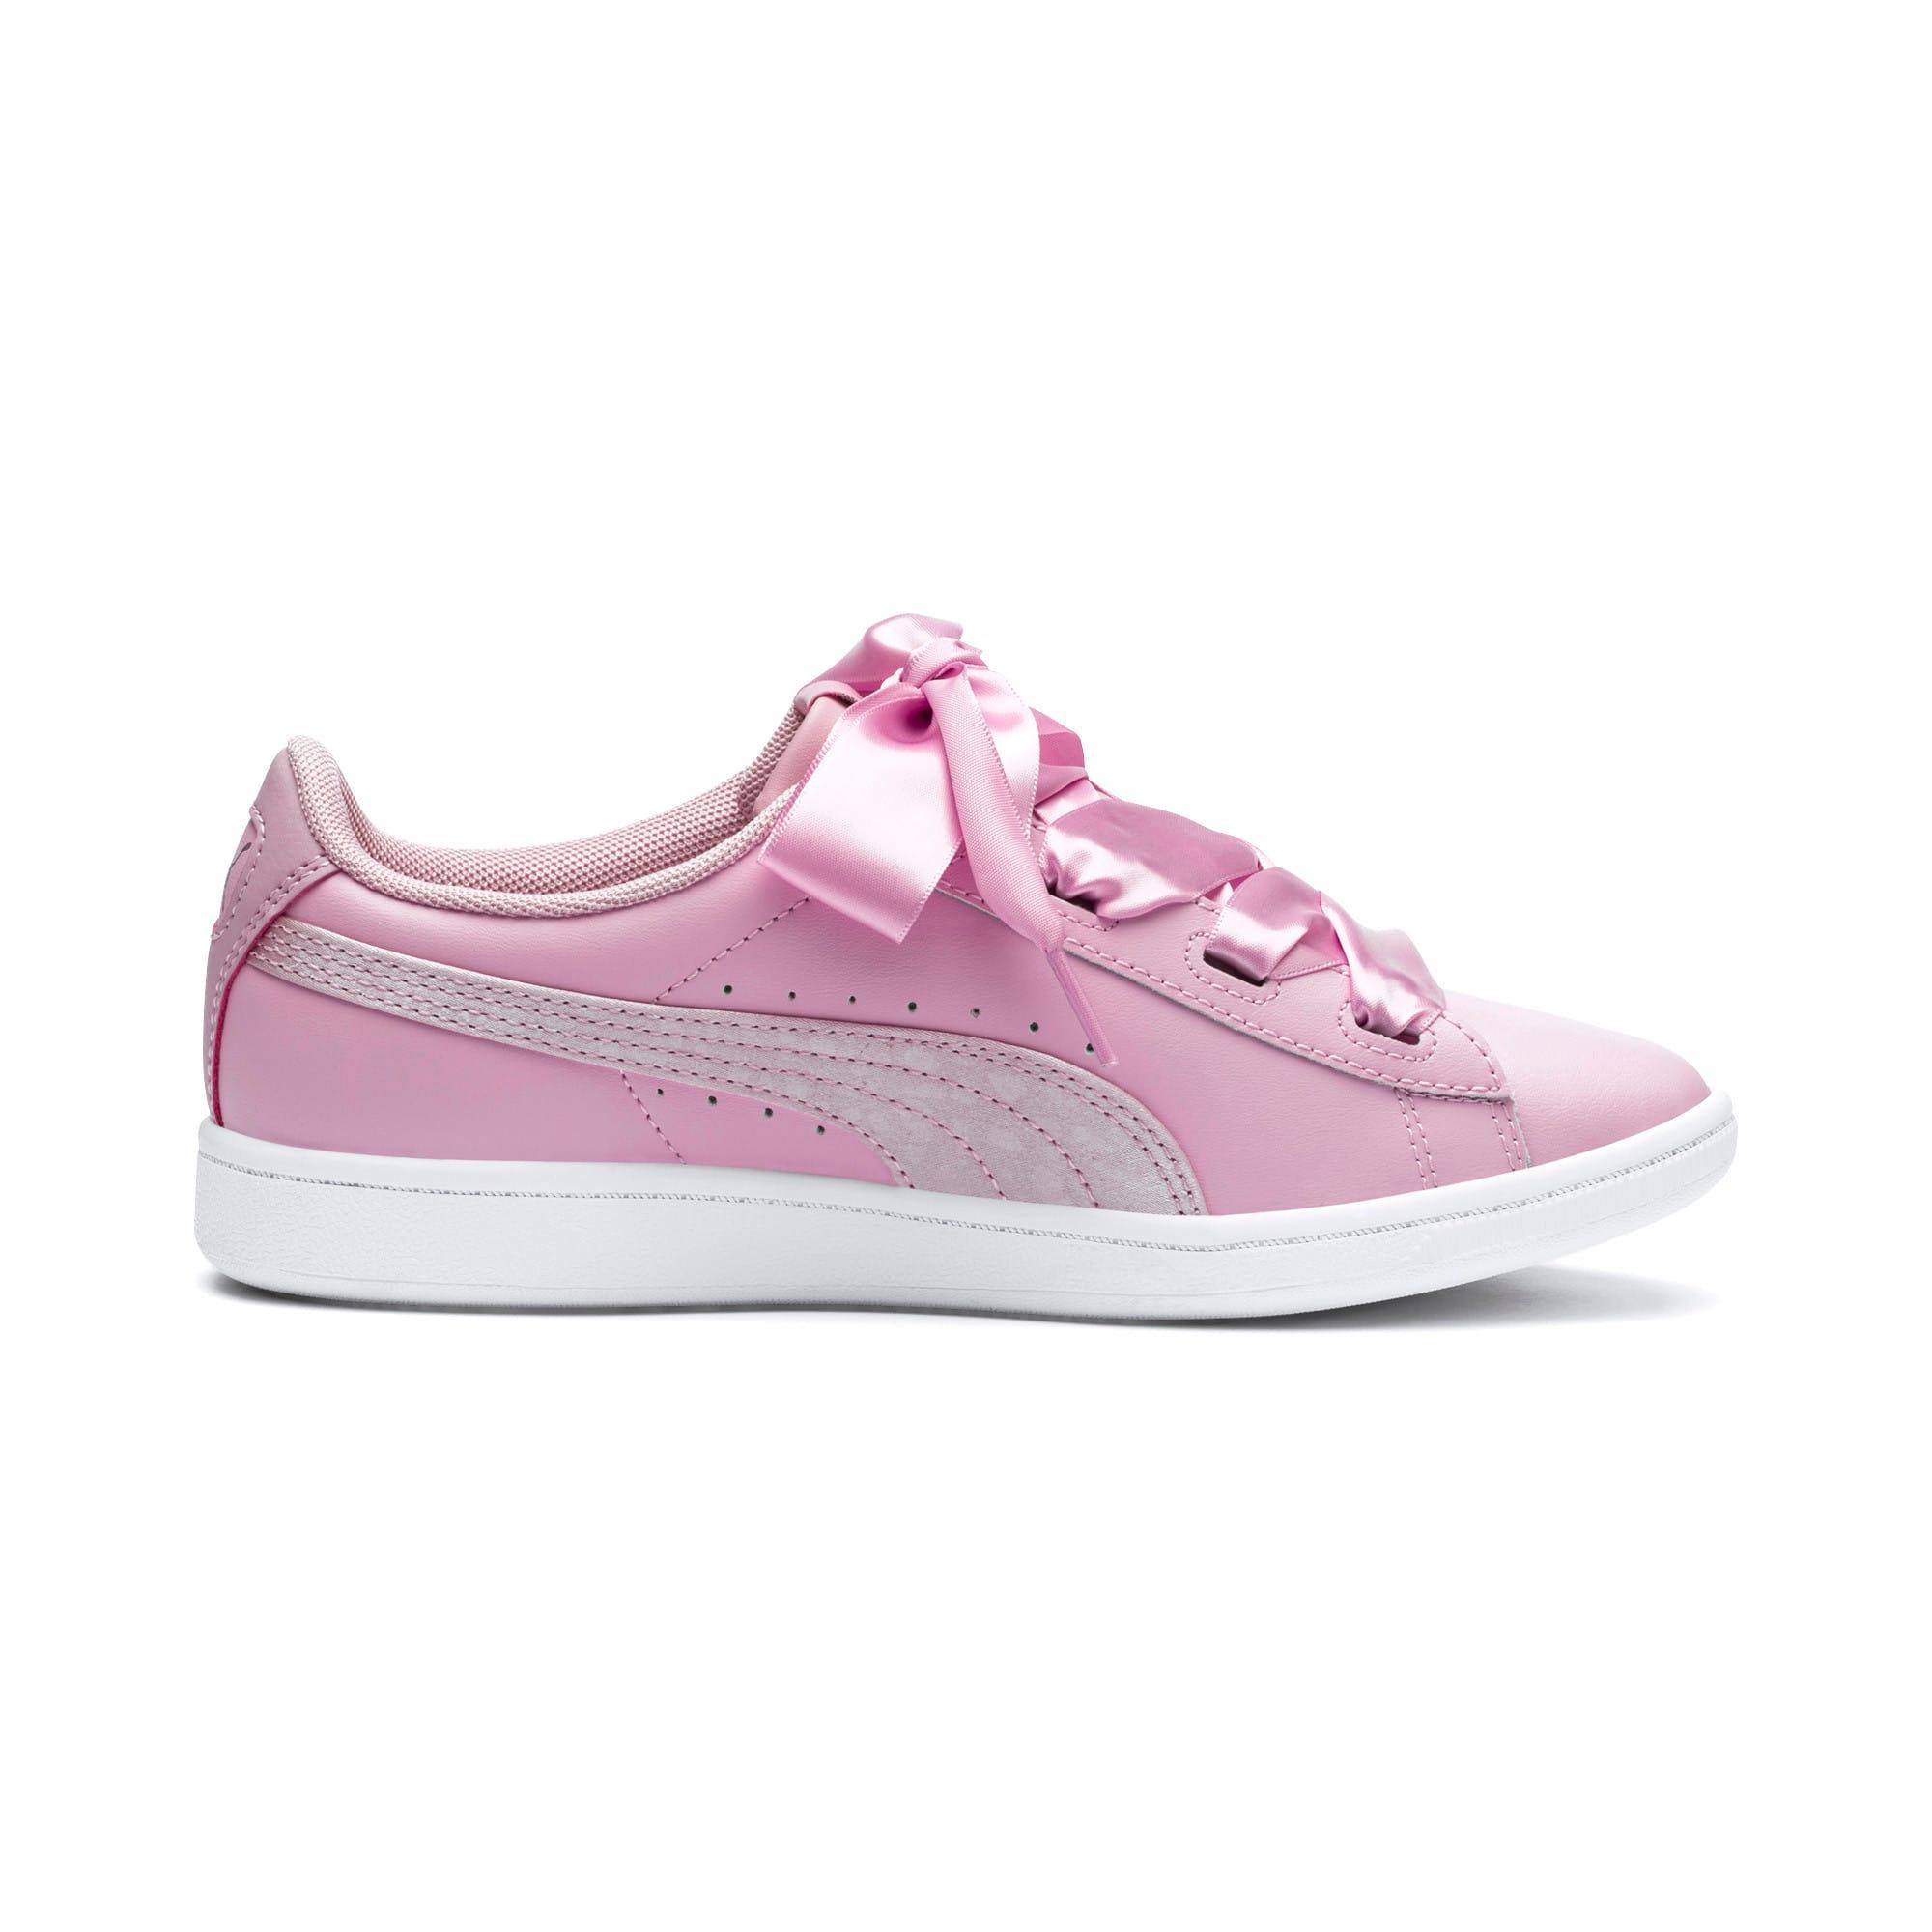 Thumbnail 5 of PUMA Vikky Ribbon Satin Sneakers JR, Pale Pink-Pale Pink, medium